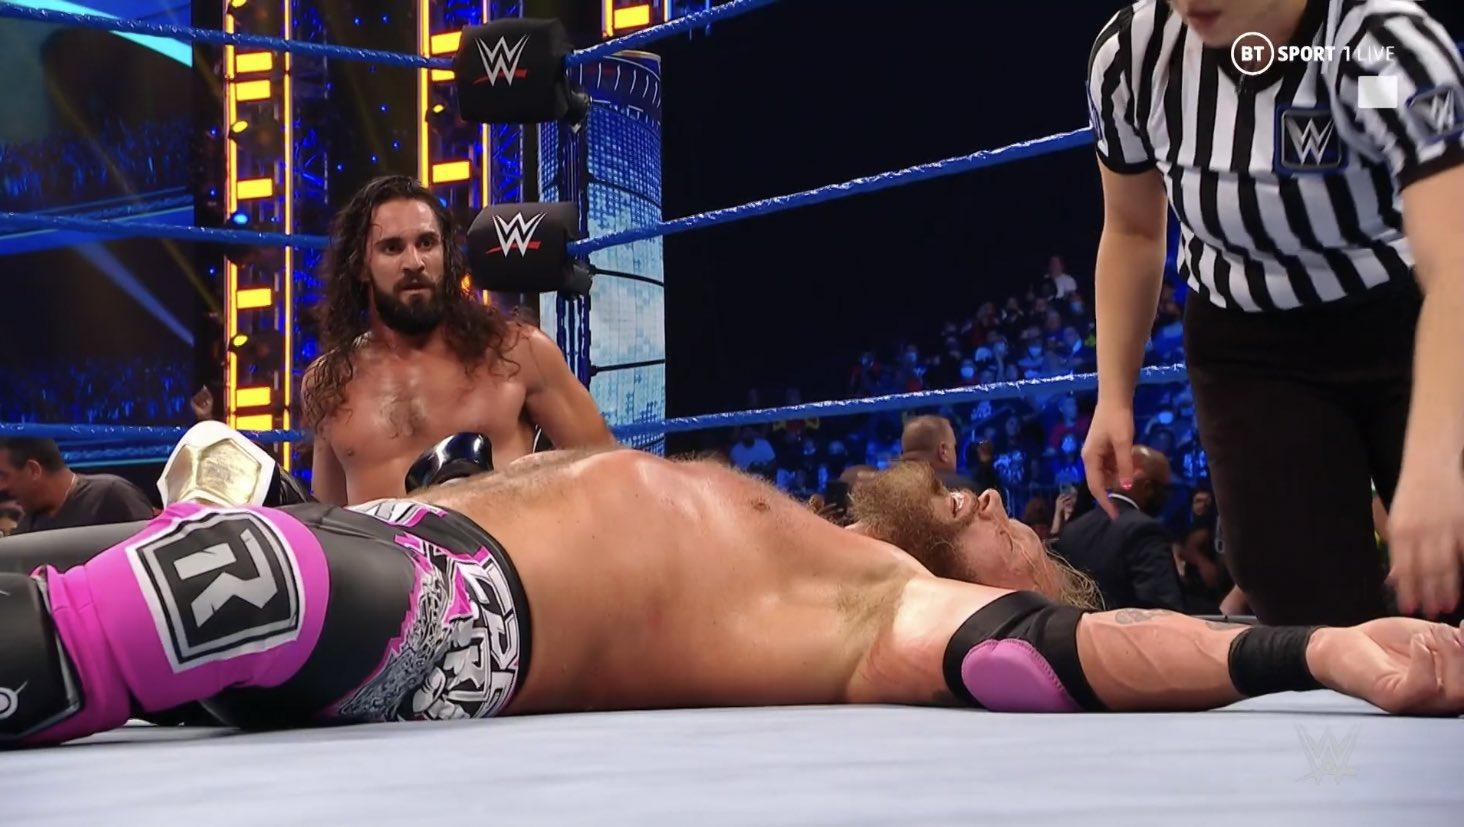 Edge Written Of WWE Storyline Following Brutal Loss Against Seth Rollins 38